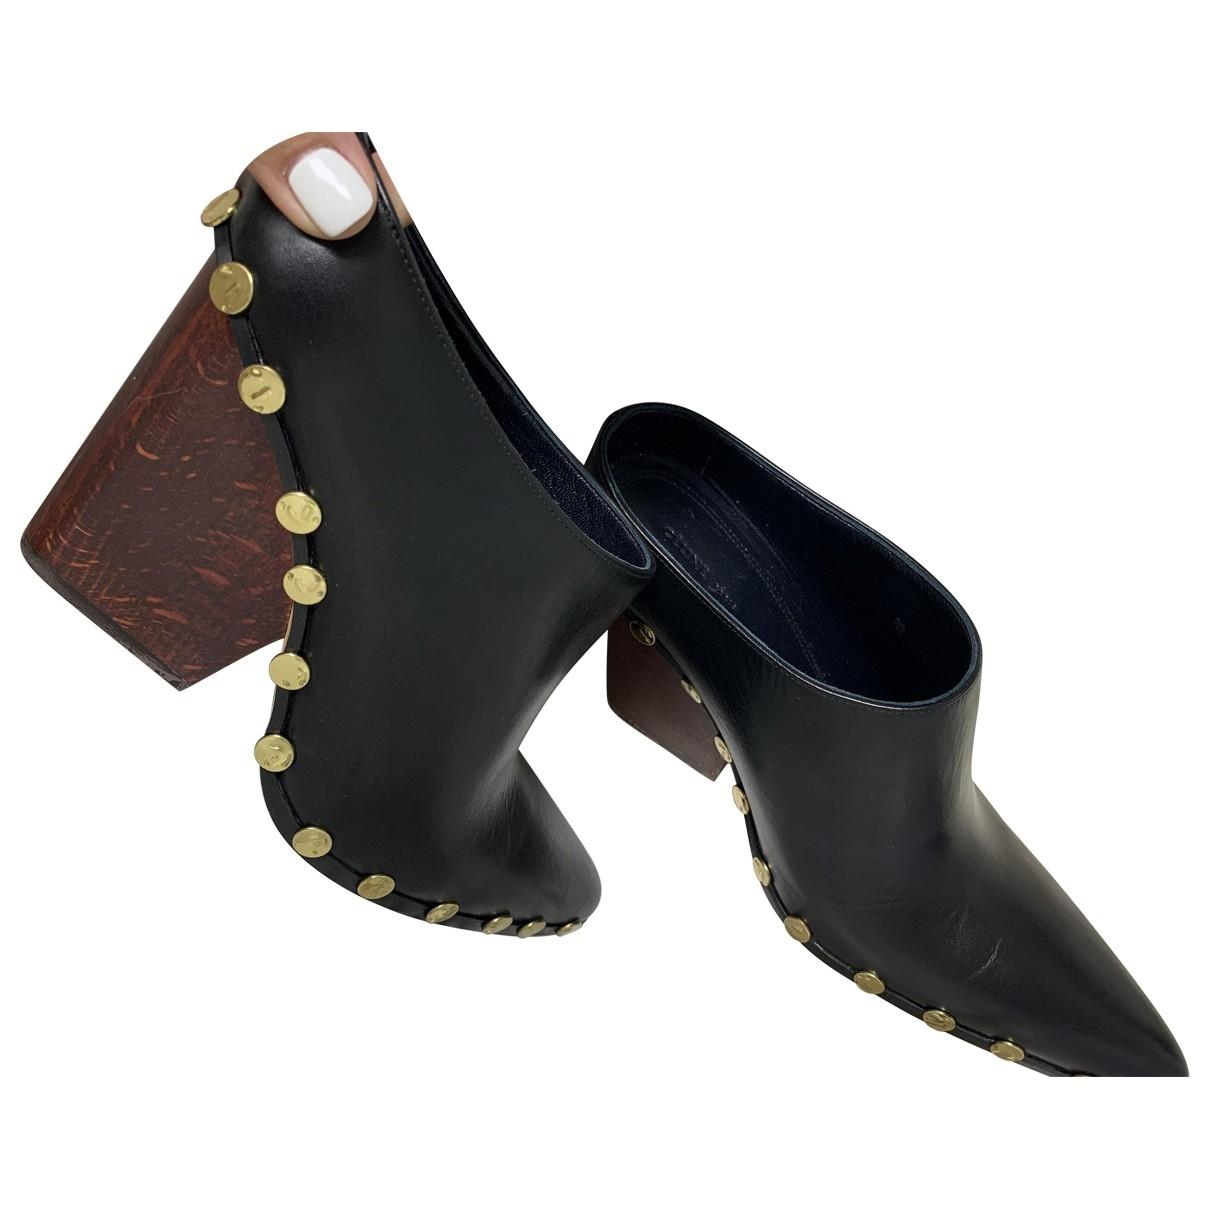 Celine Rodéo Black Leather Mules & Clogs for Women 38 EU